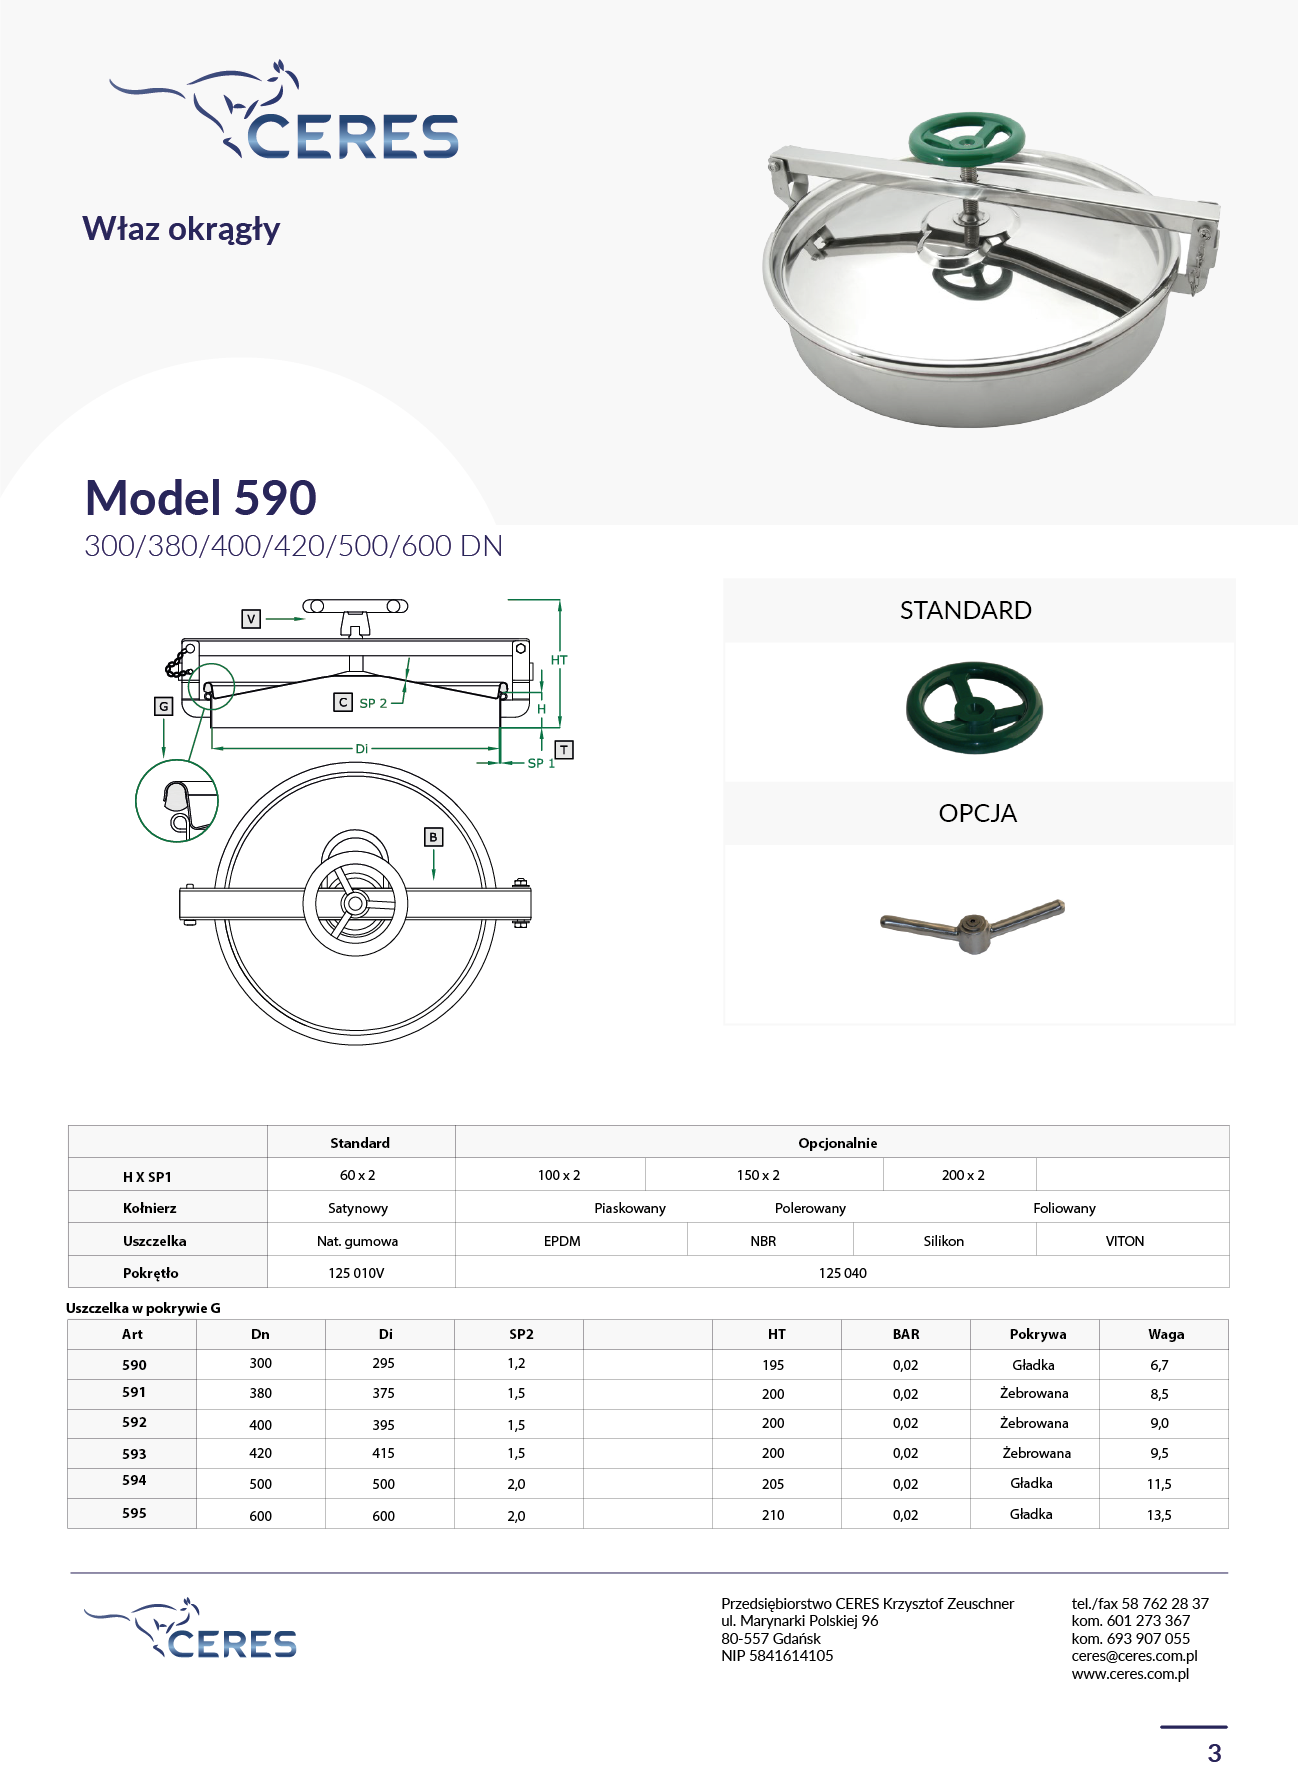 MODEL 590